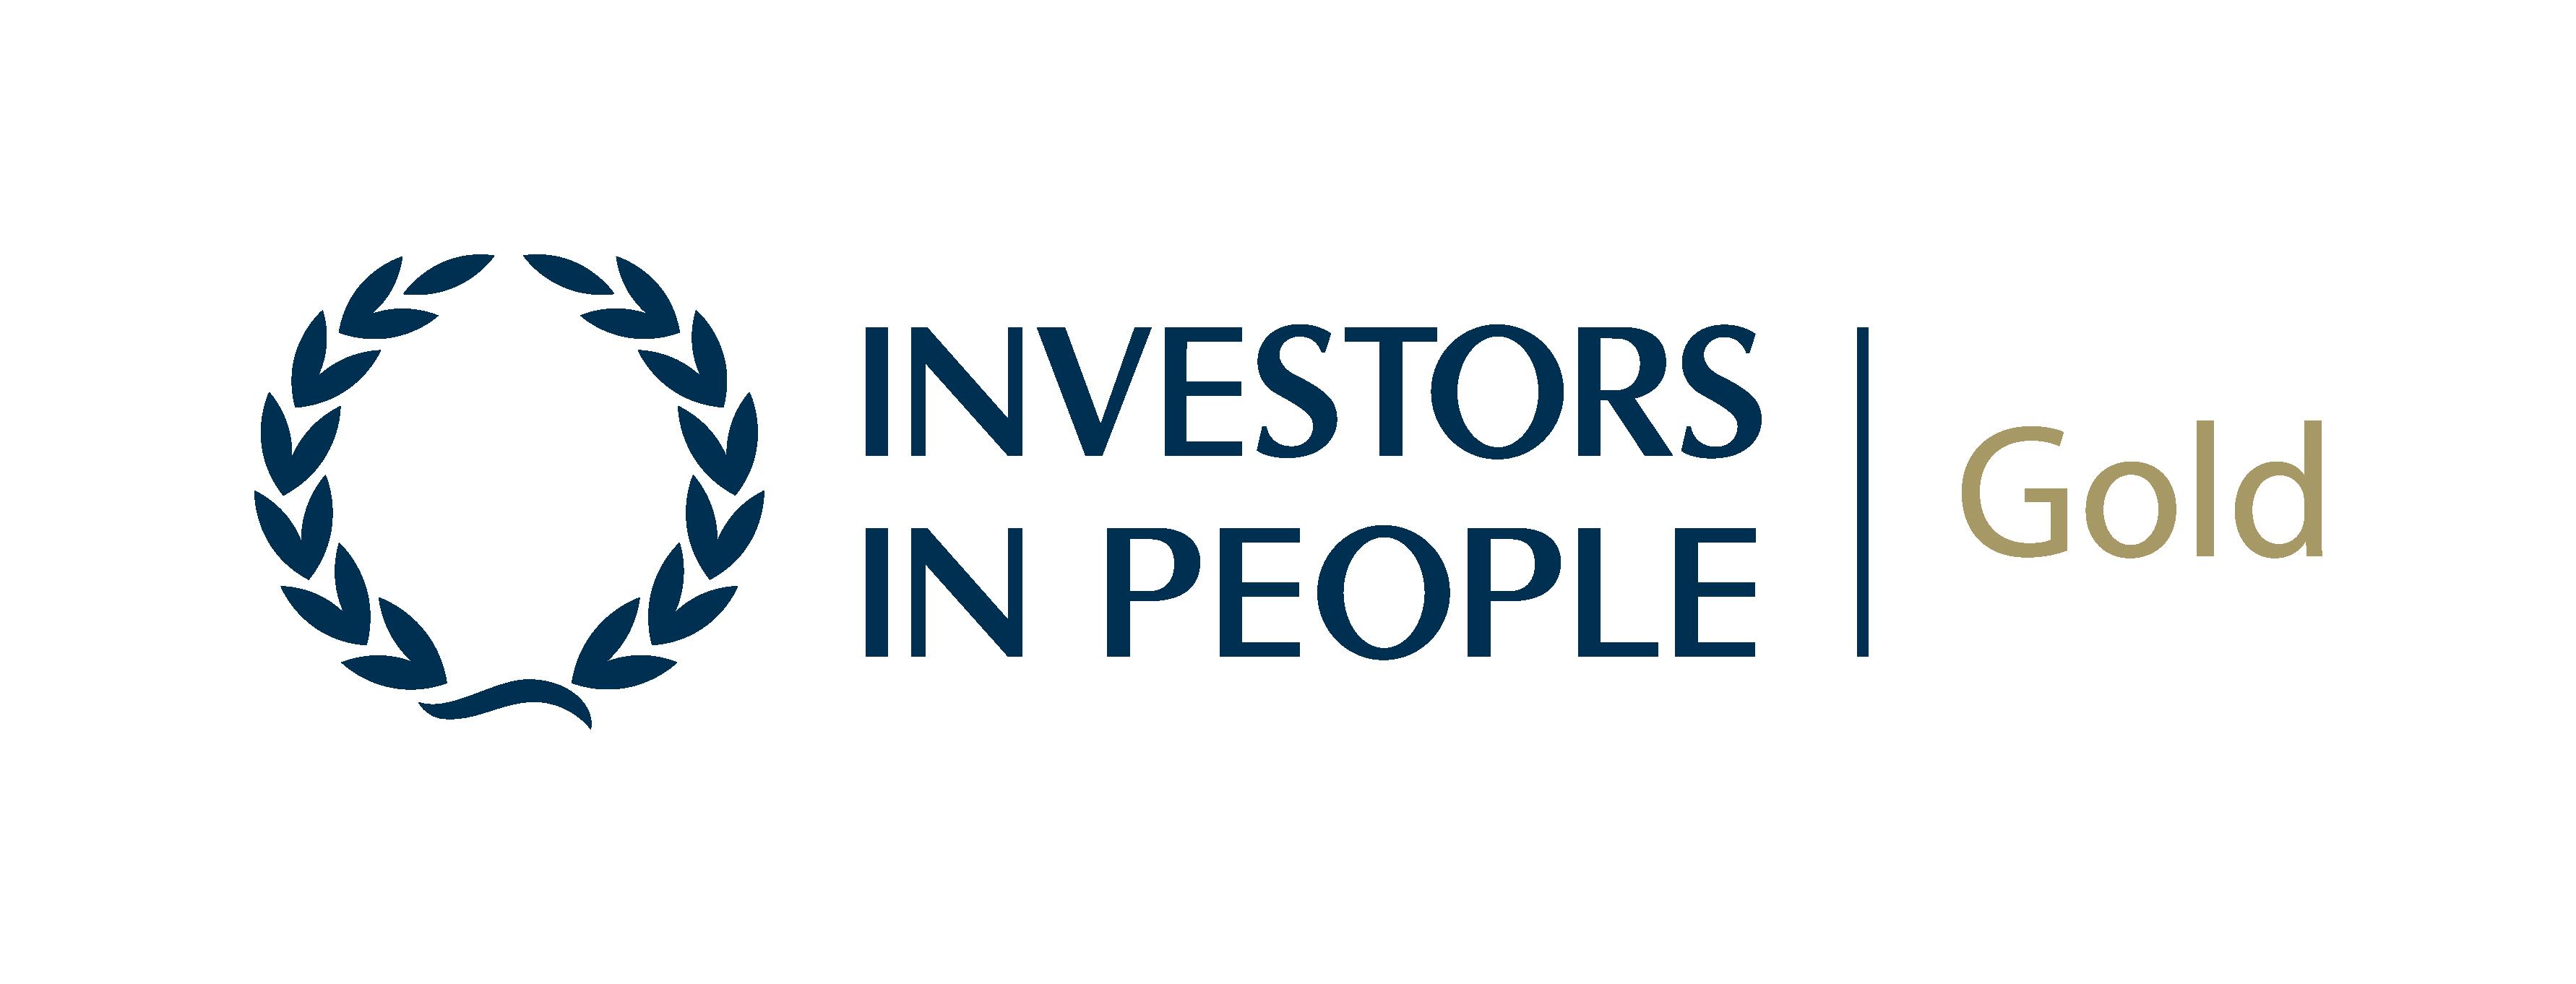 Investors in People Gold